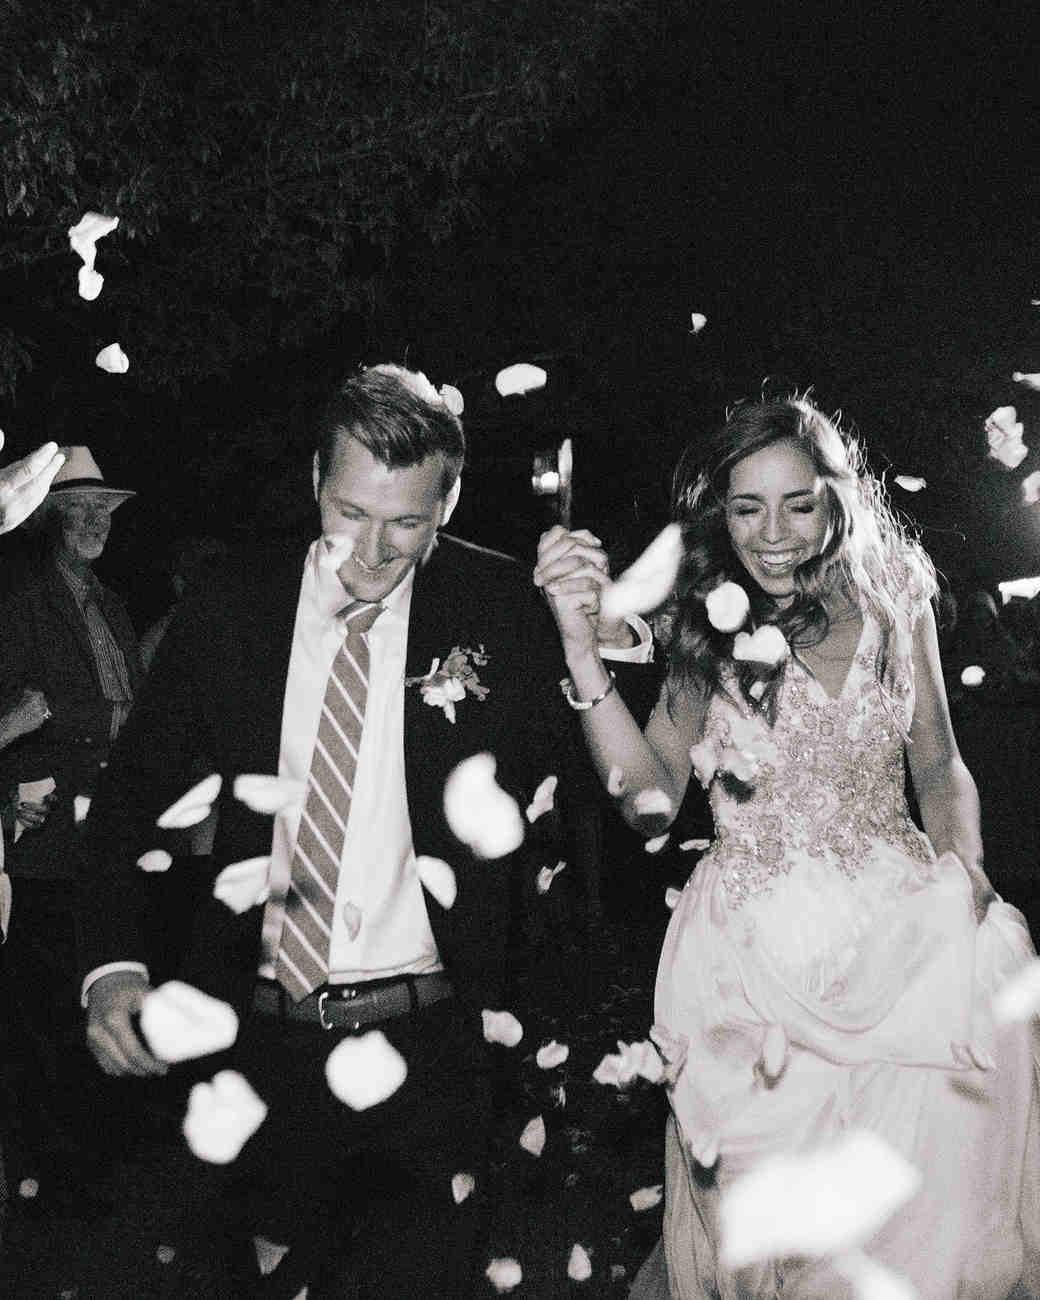 mackenzie-boman-wedding-sendoff-236-s112693-0316.jpg